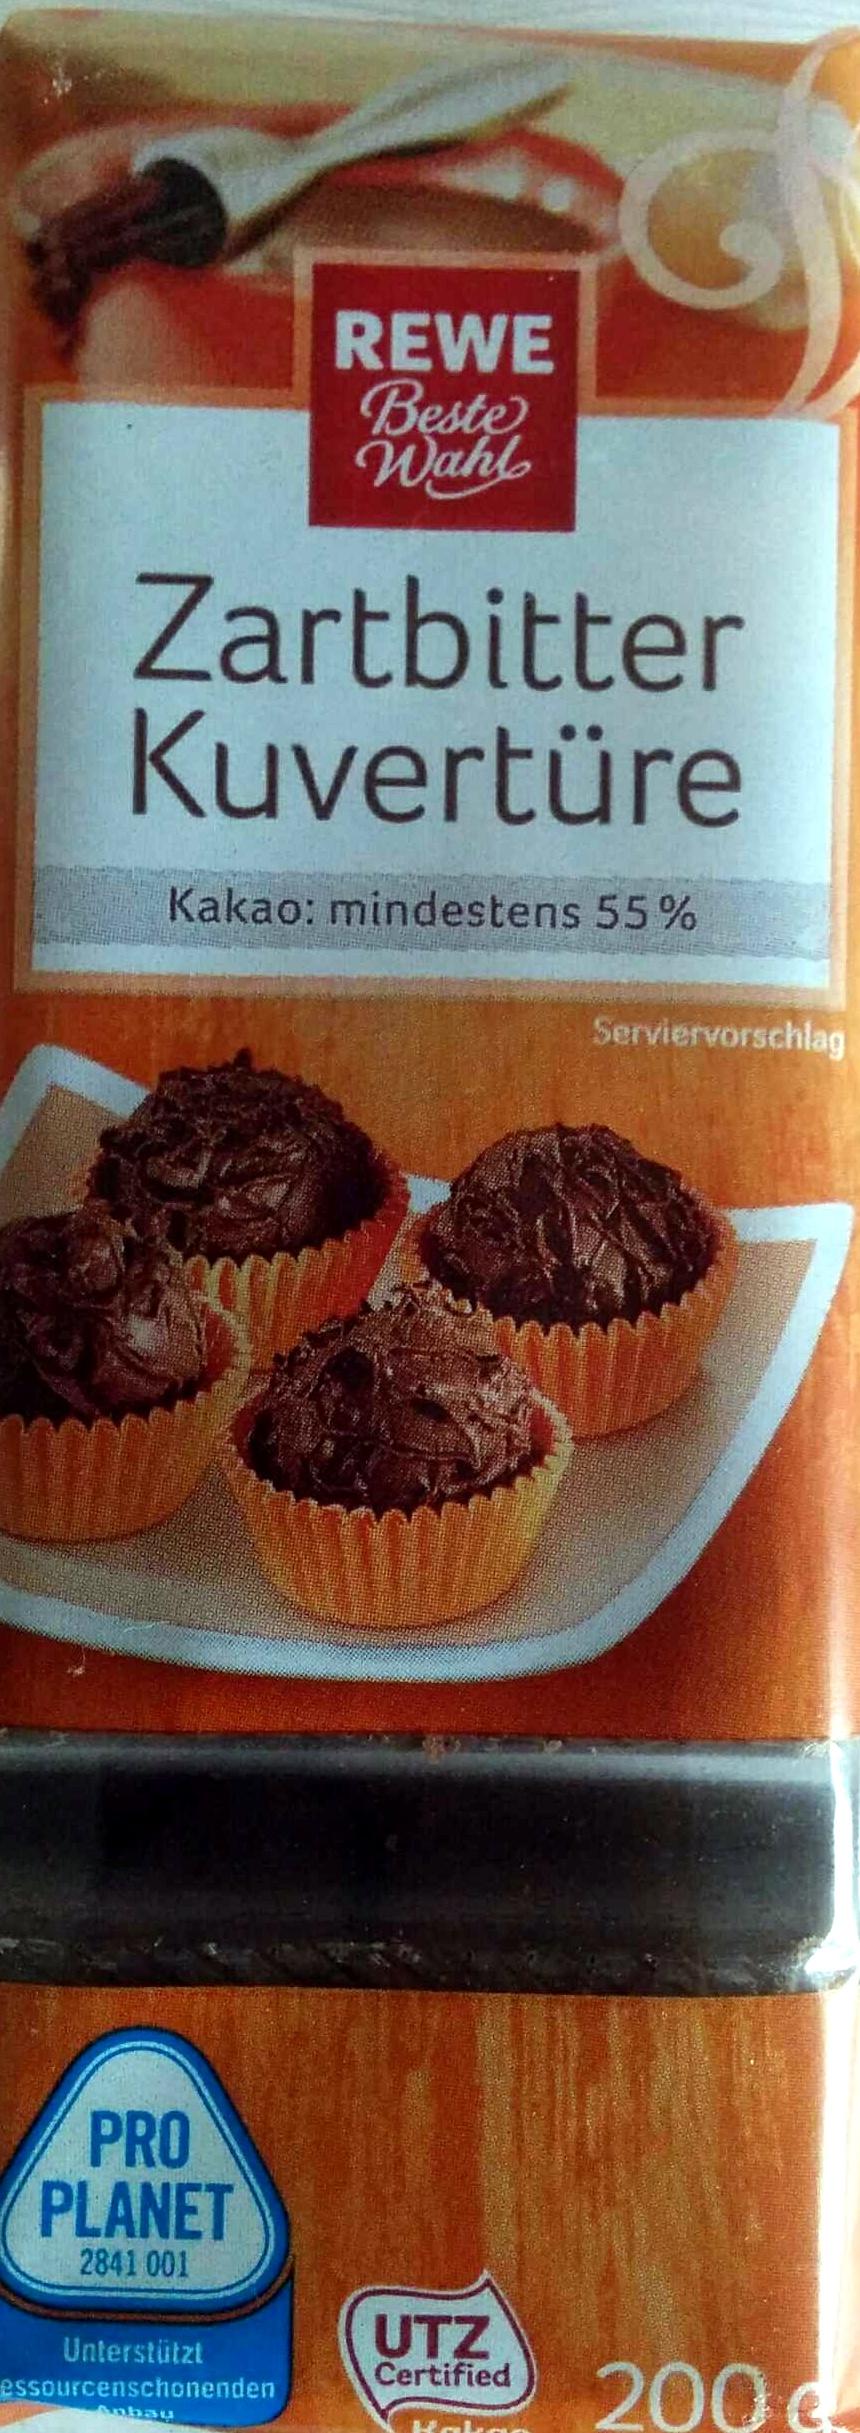 Zartbitter Kuvertüre - Produit